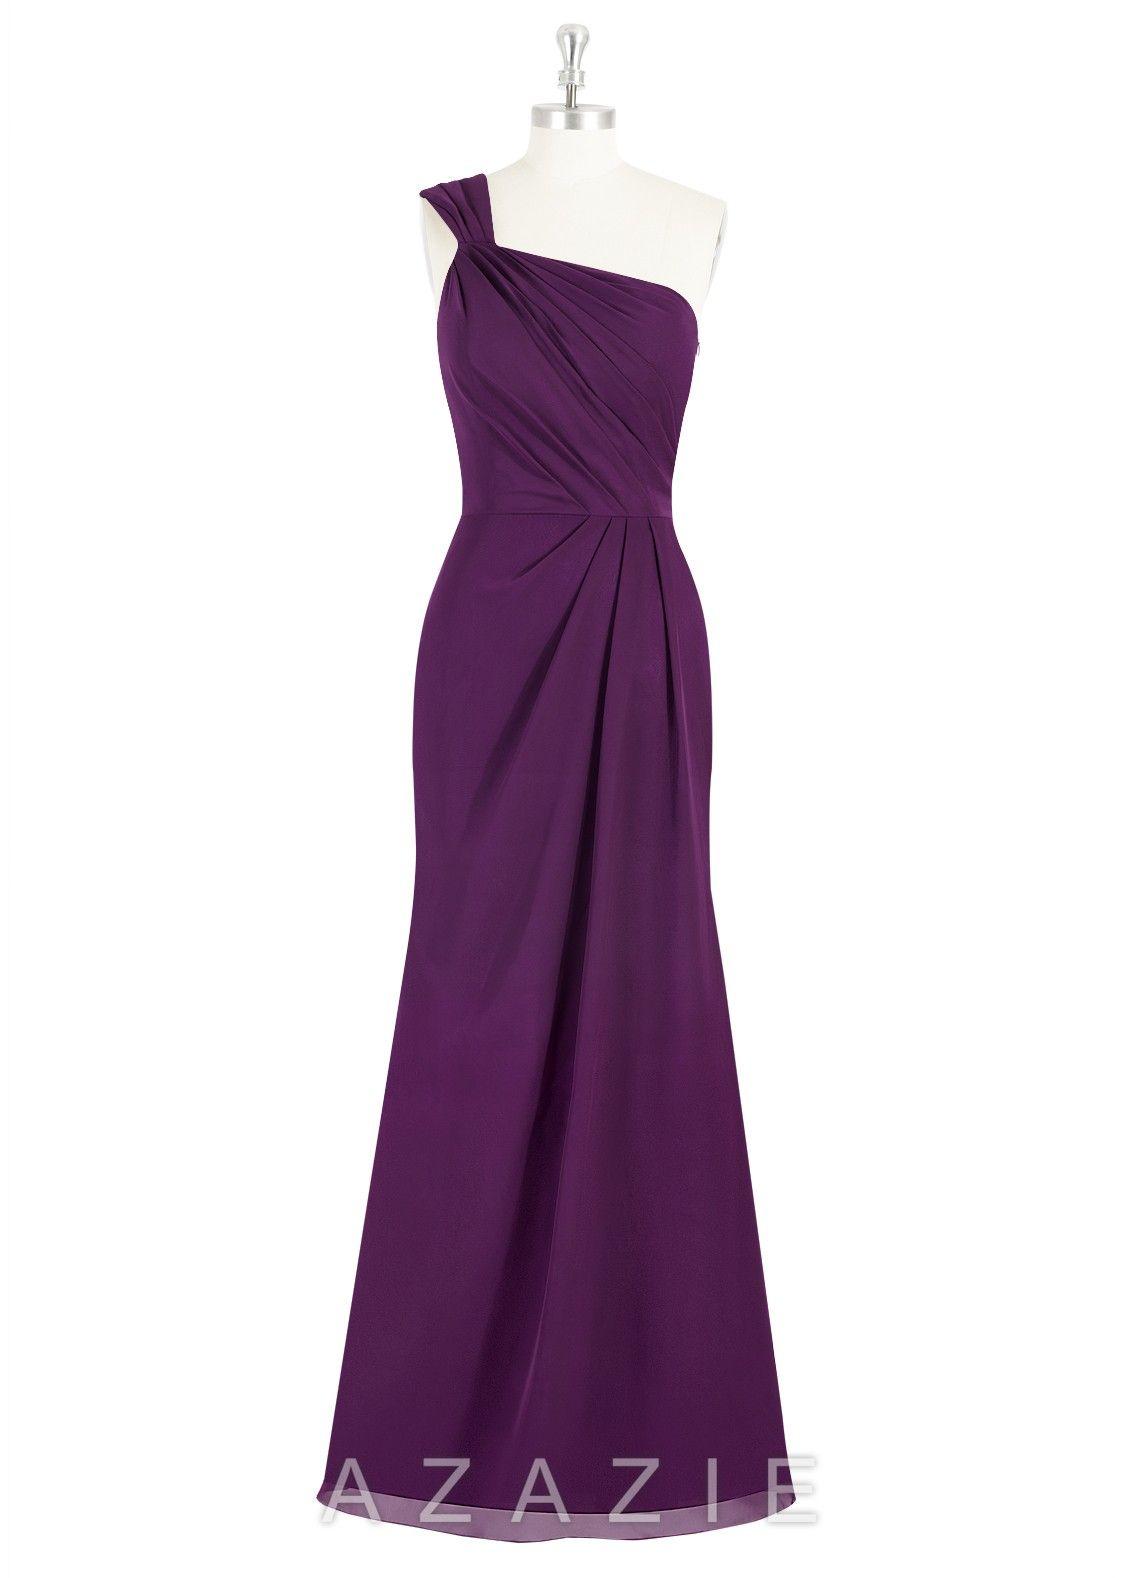 Azazie Carissa $269.99 ALL BRIDESMAID DRESSES